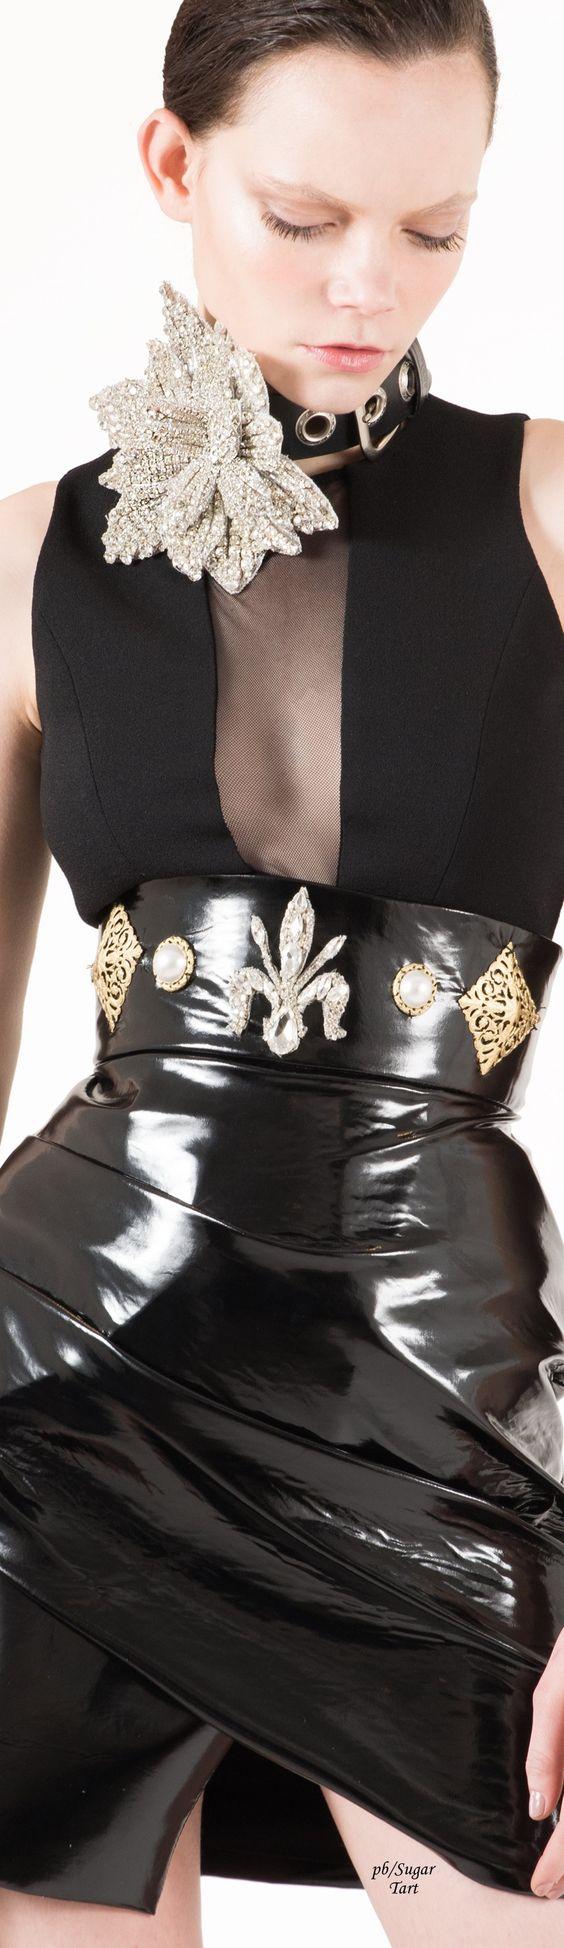 High-waisted PVC skirt